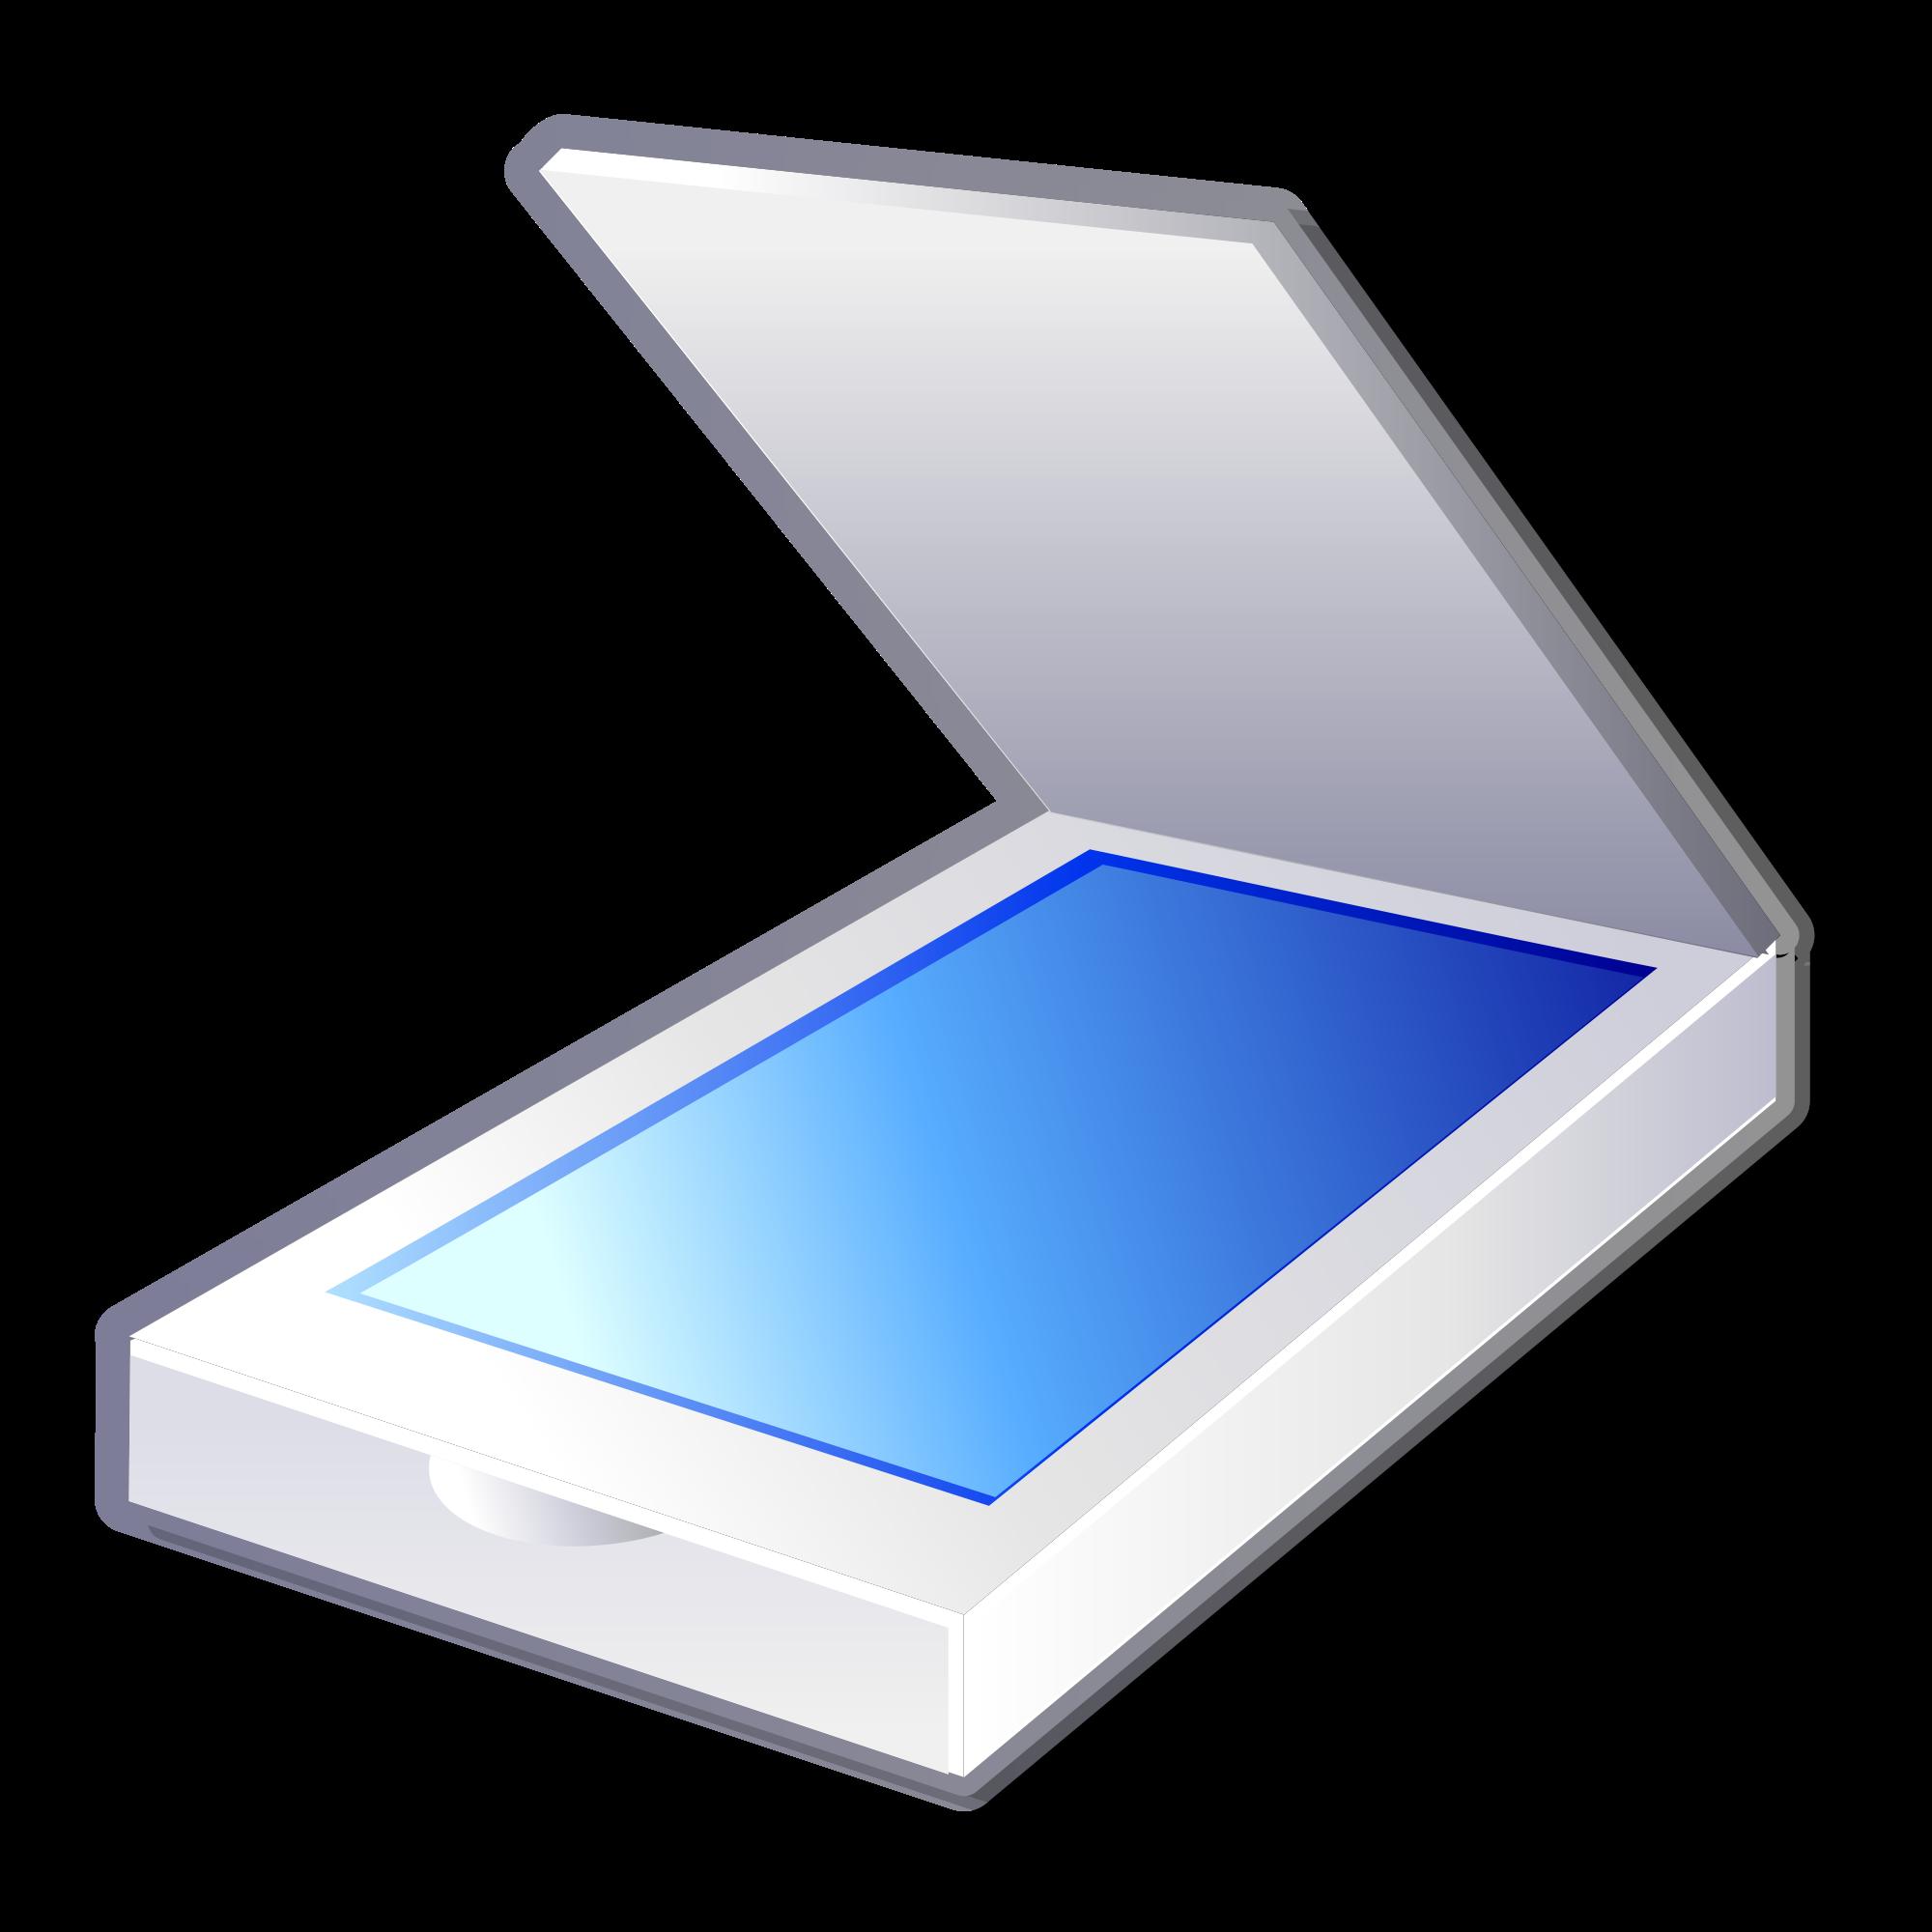 Scanner HD PNG - 95292